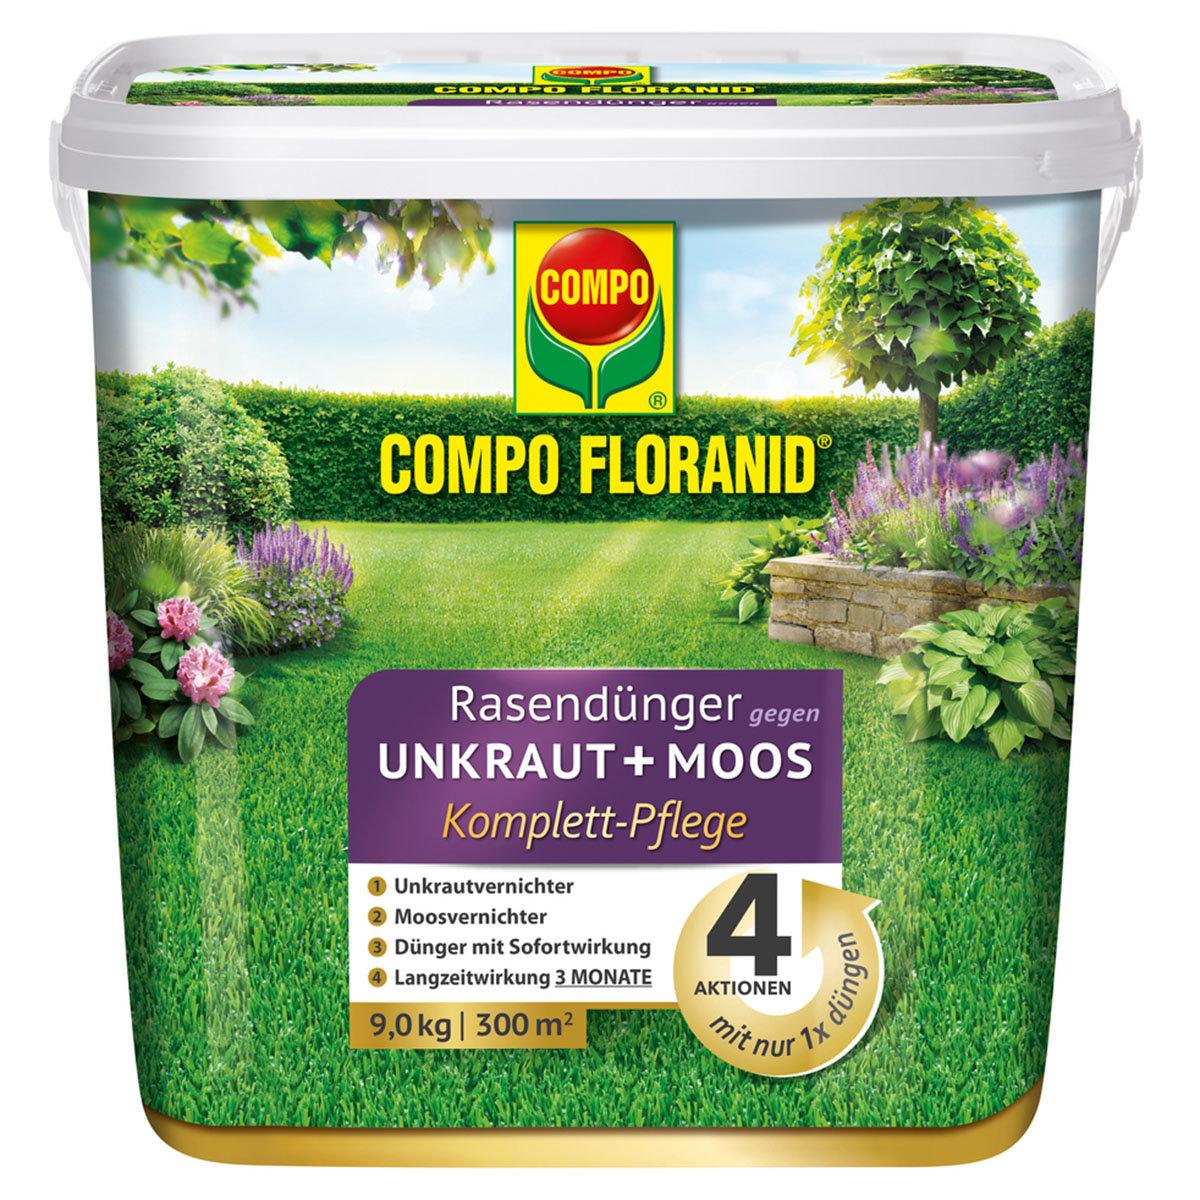 Floranid Rasendünger gegen Unkraut + Moos, 9 kg